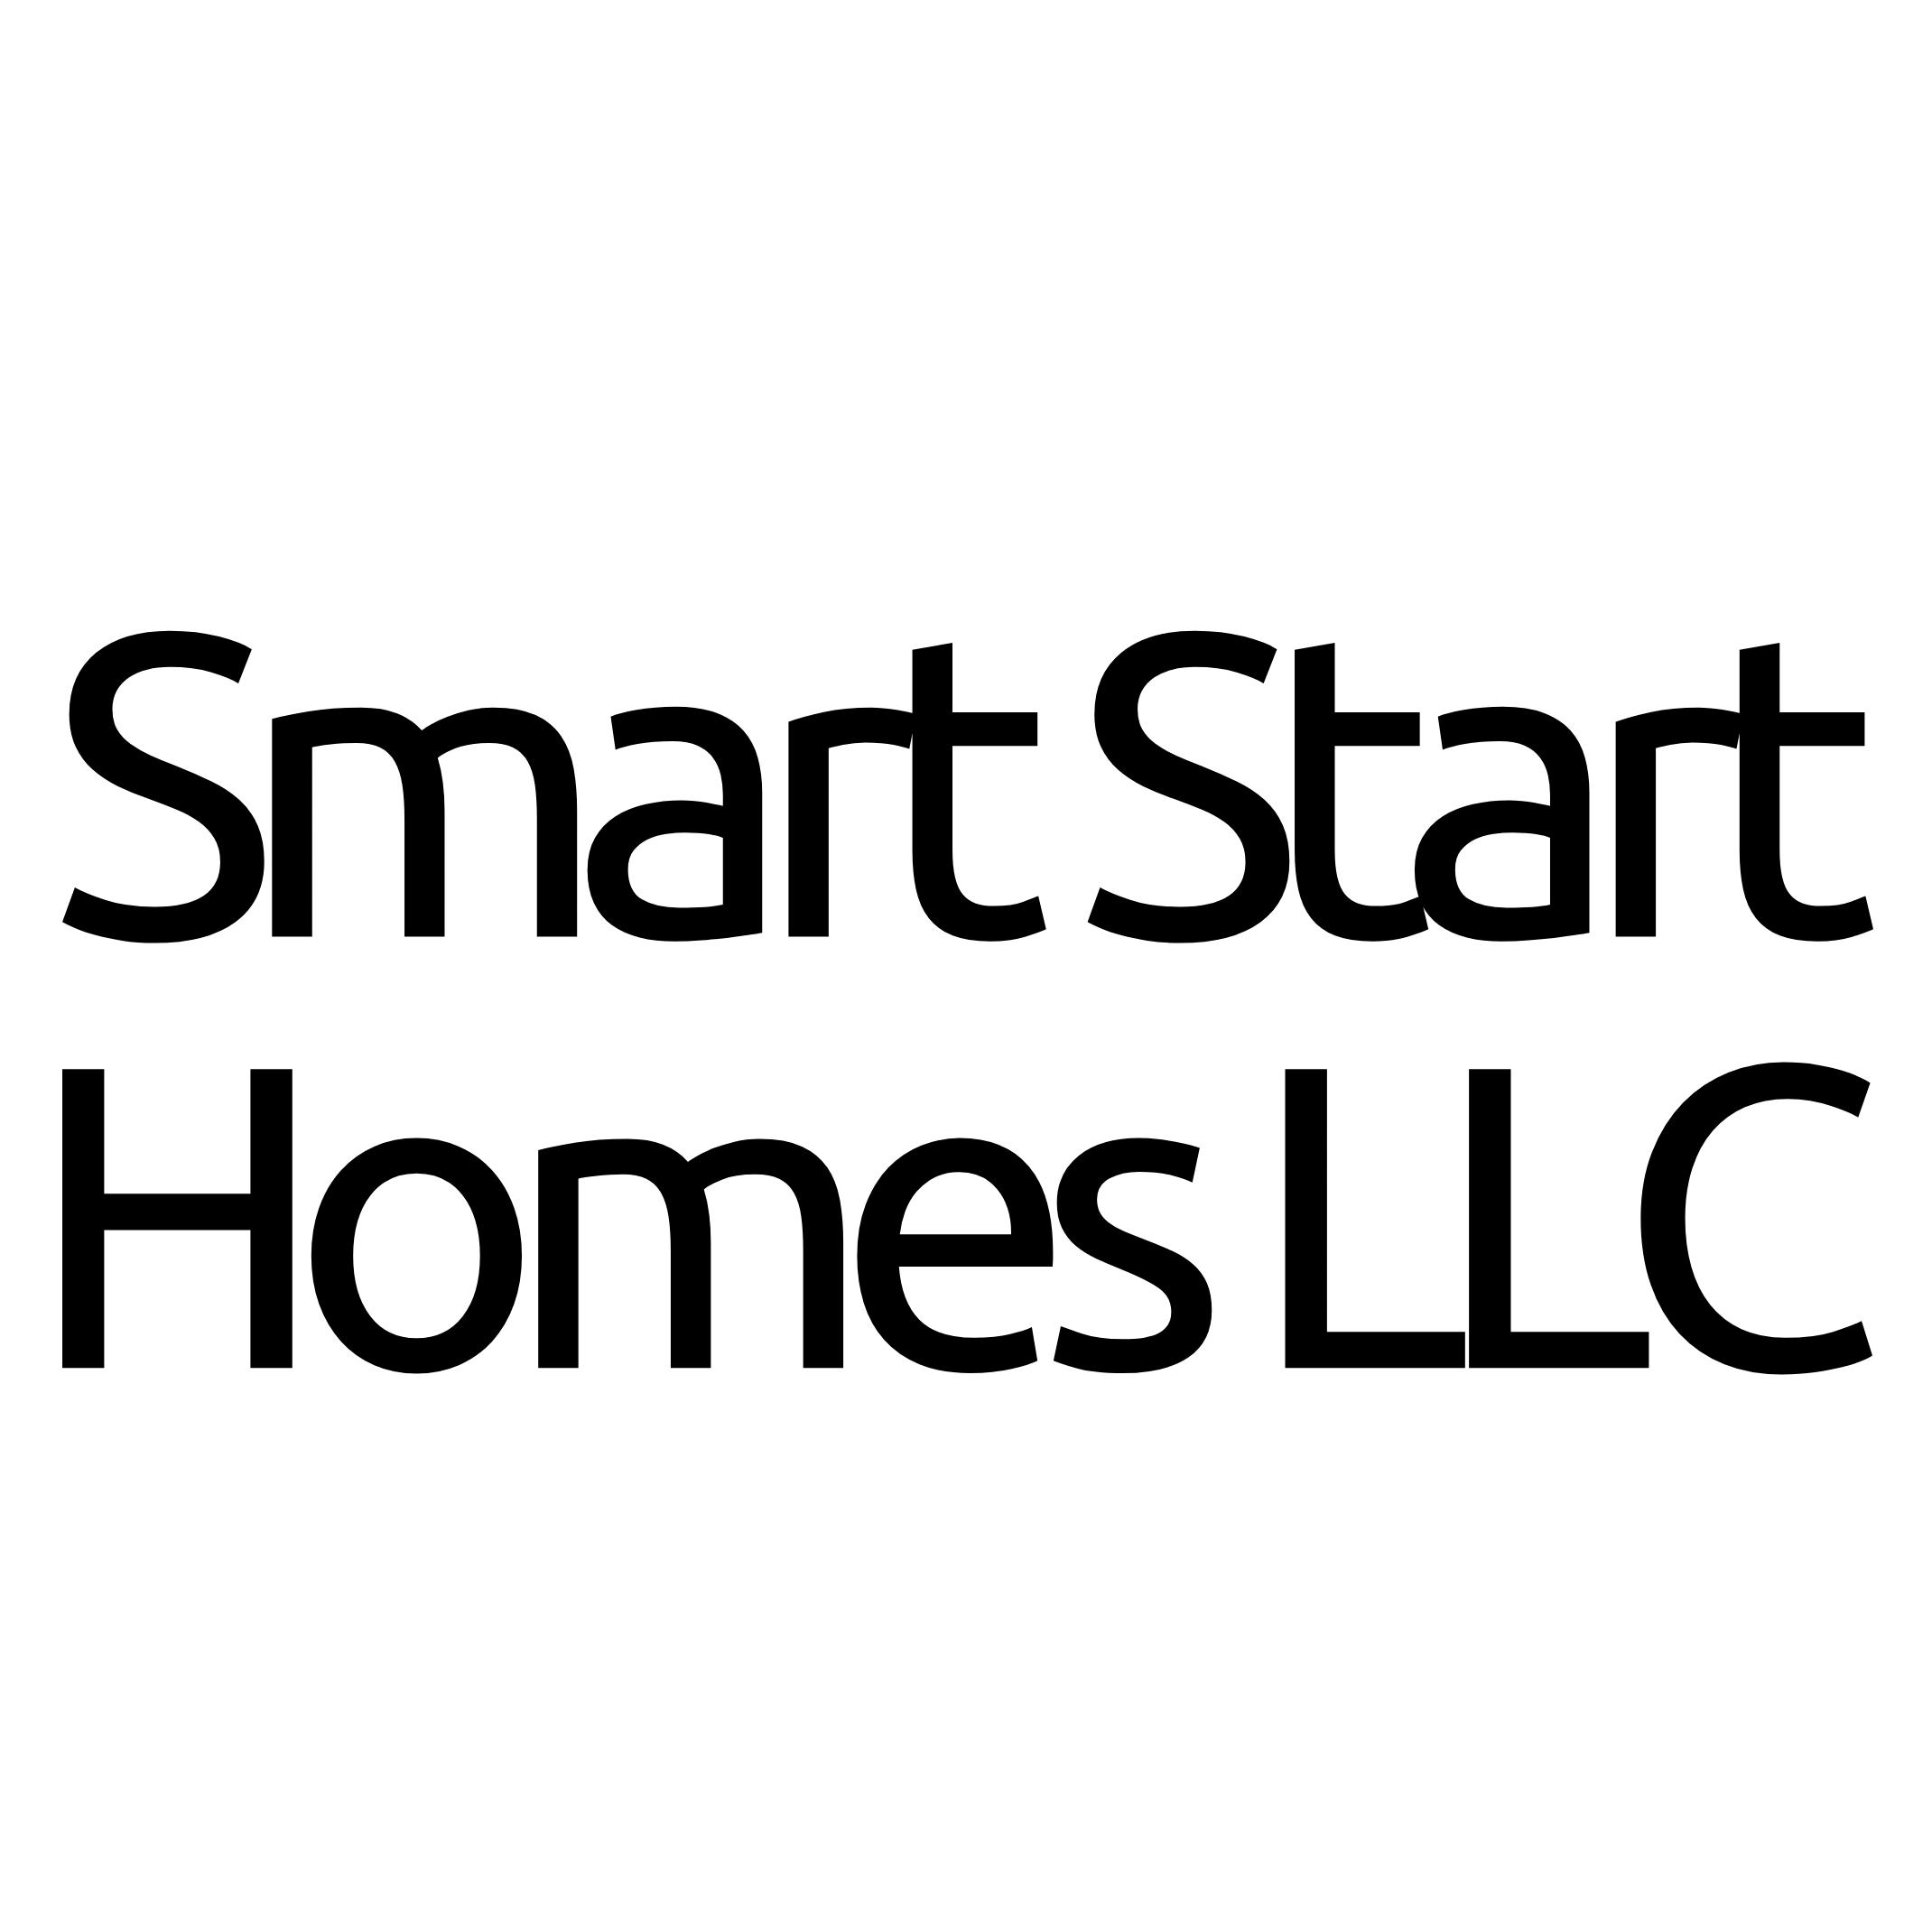 Smart Start Homes LLC - Cambridge, WI - Real Estate Agents